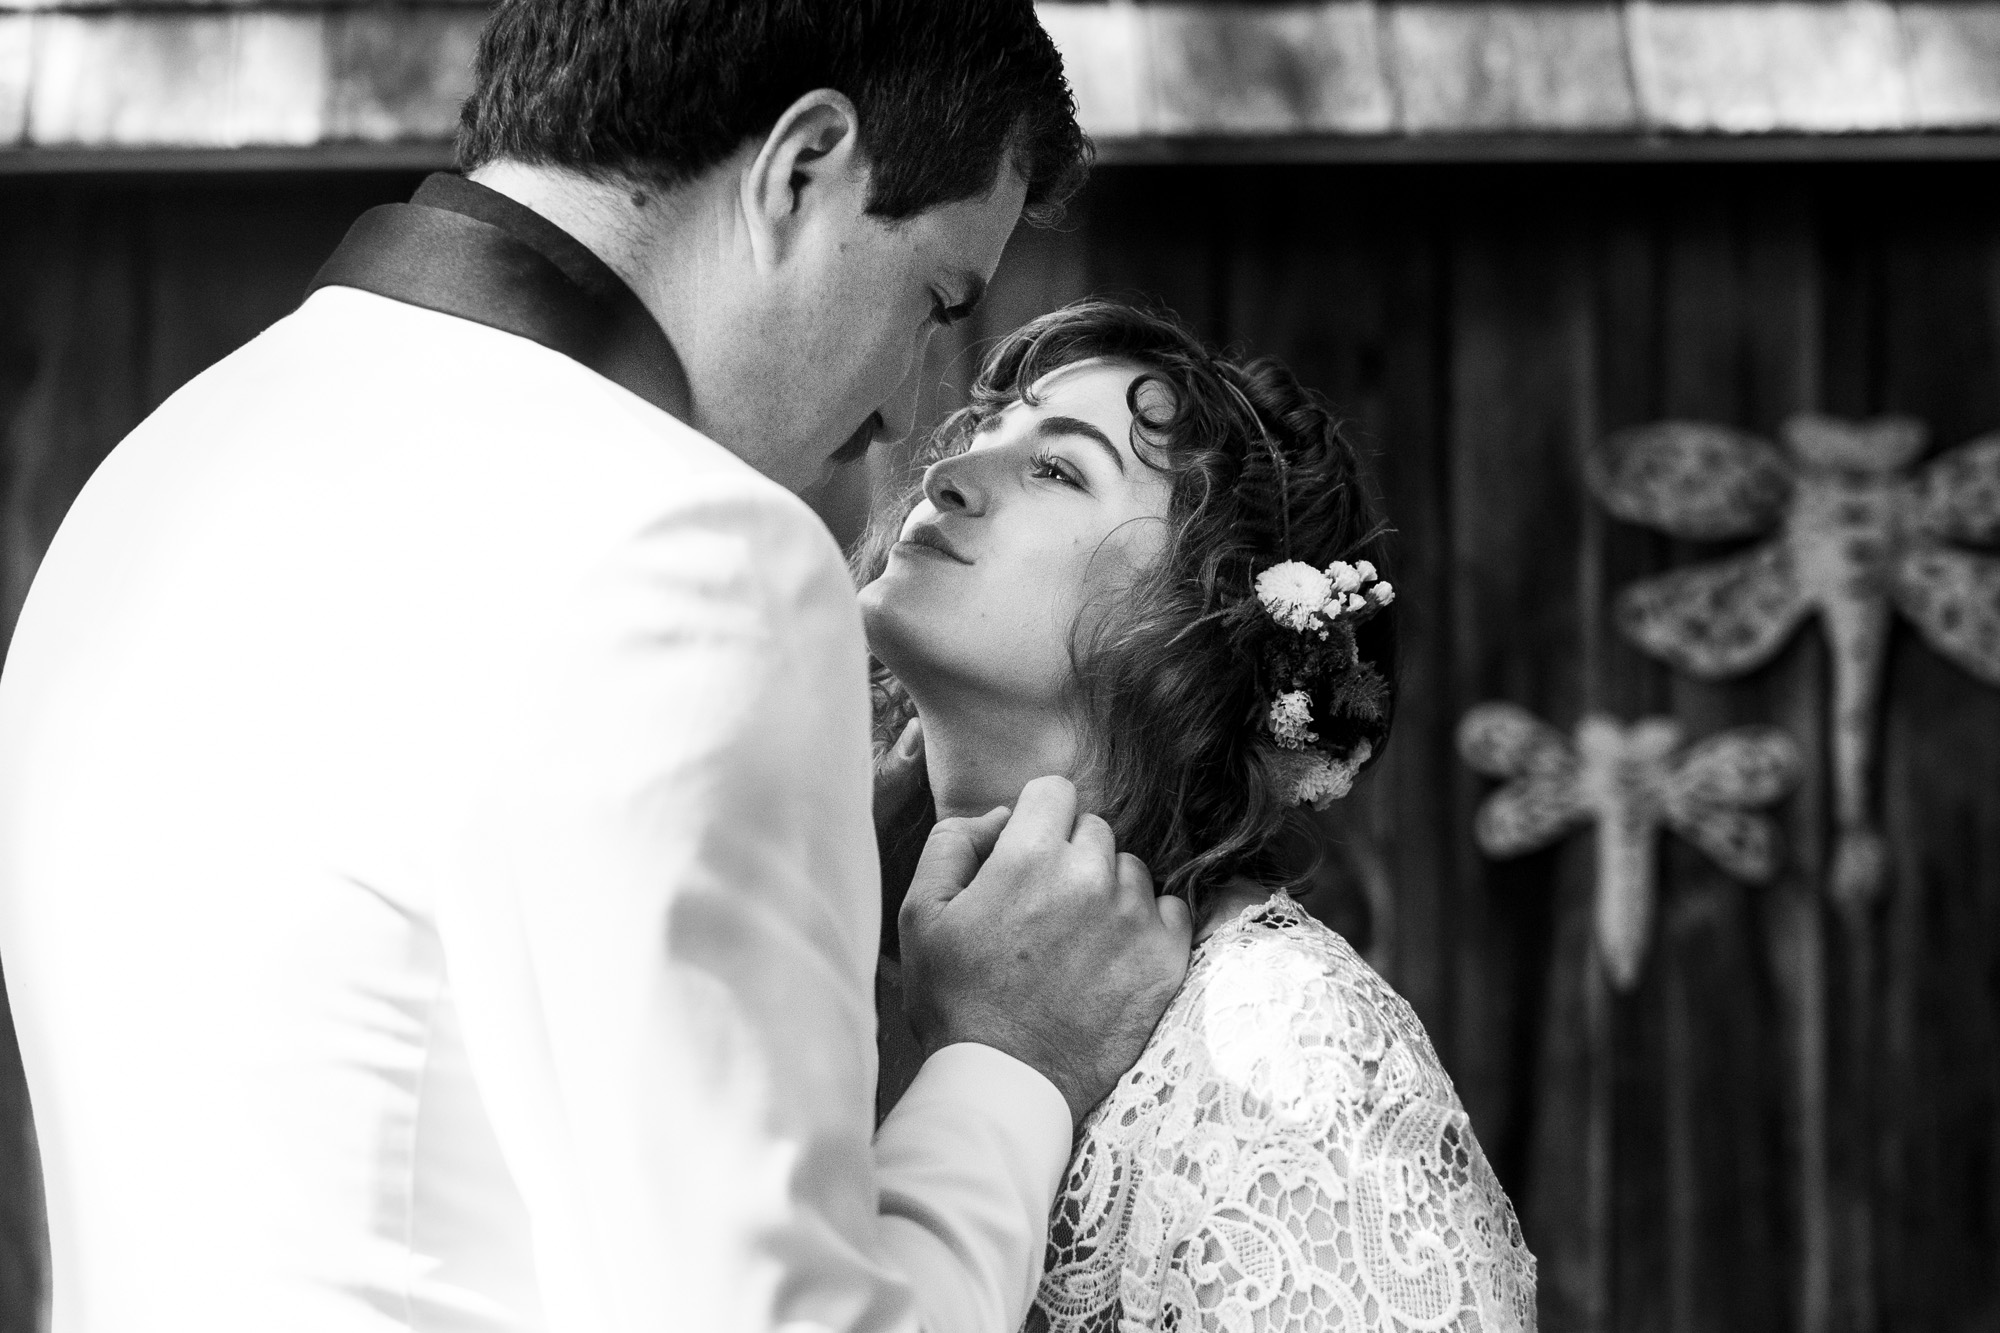 Seriously_Sabrina_Photography_Red_River_Gorge_Kentucky_Wedding_ShawnDana67.jpg